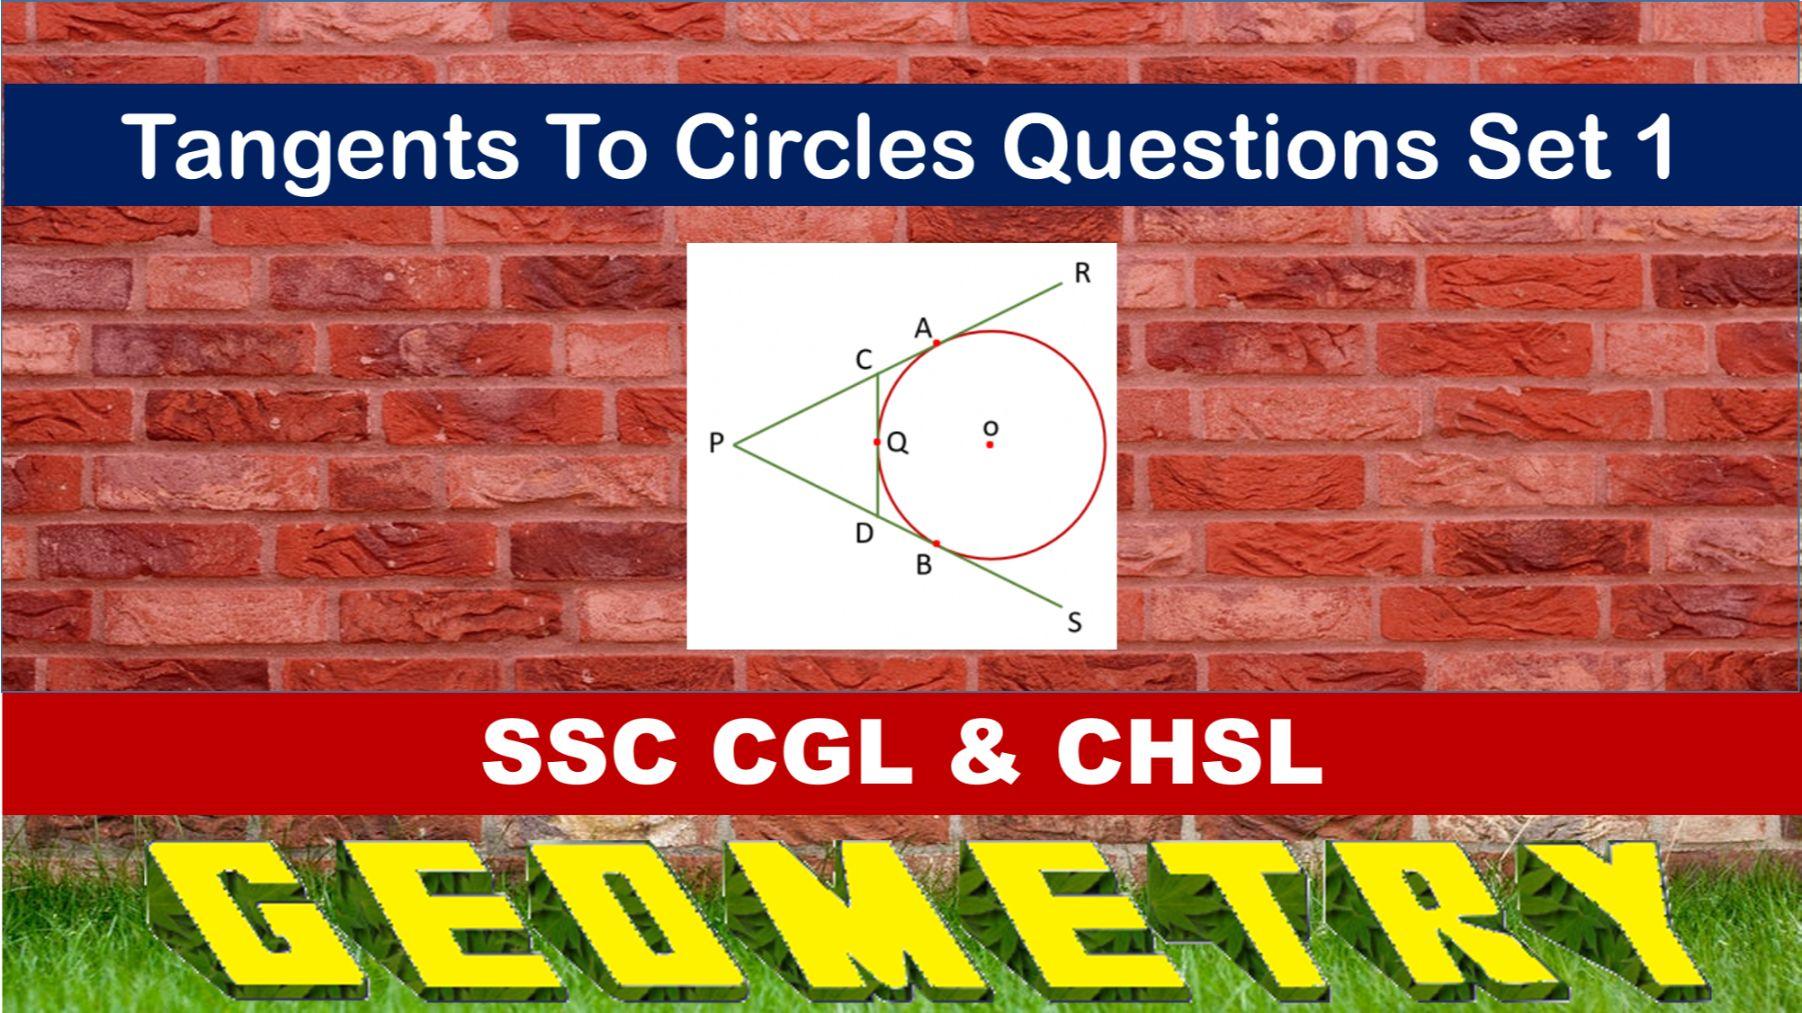 SSC CGL Geometry Tangent To Circles Set 1